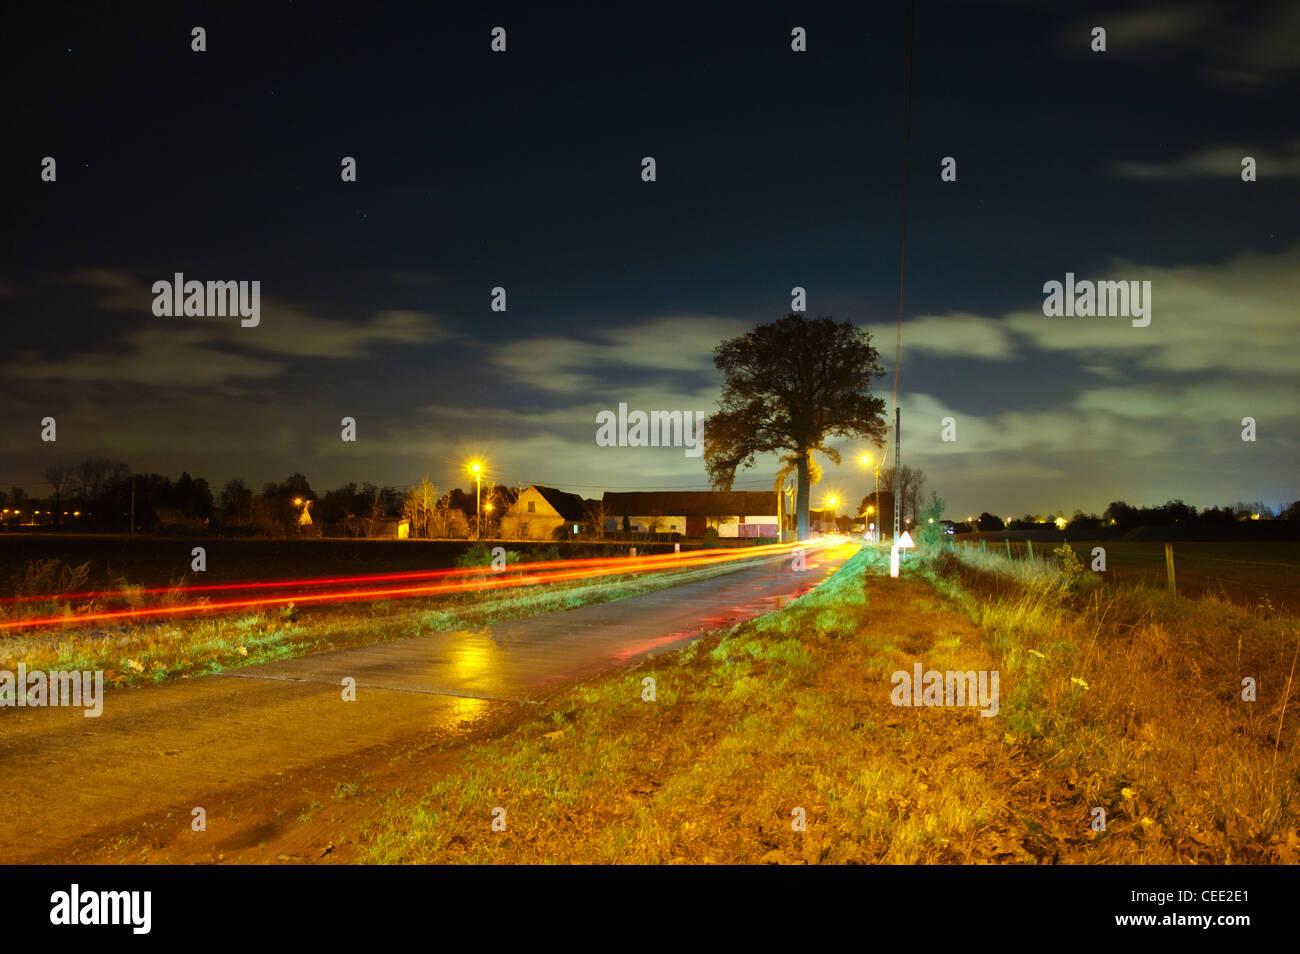 Nicht Scenery in a village in Flanders - Stock Image